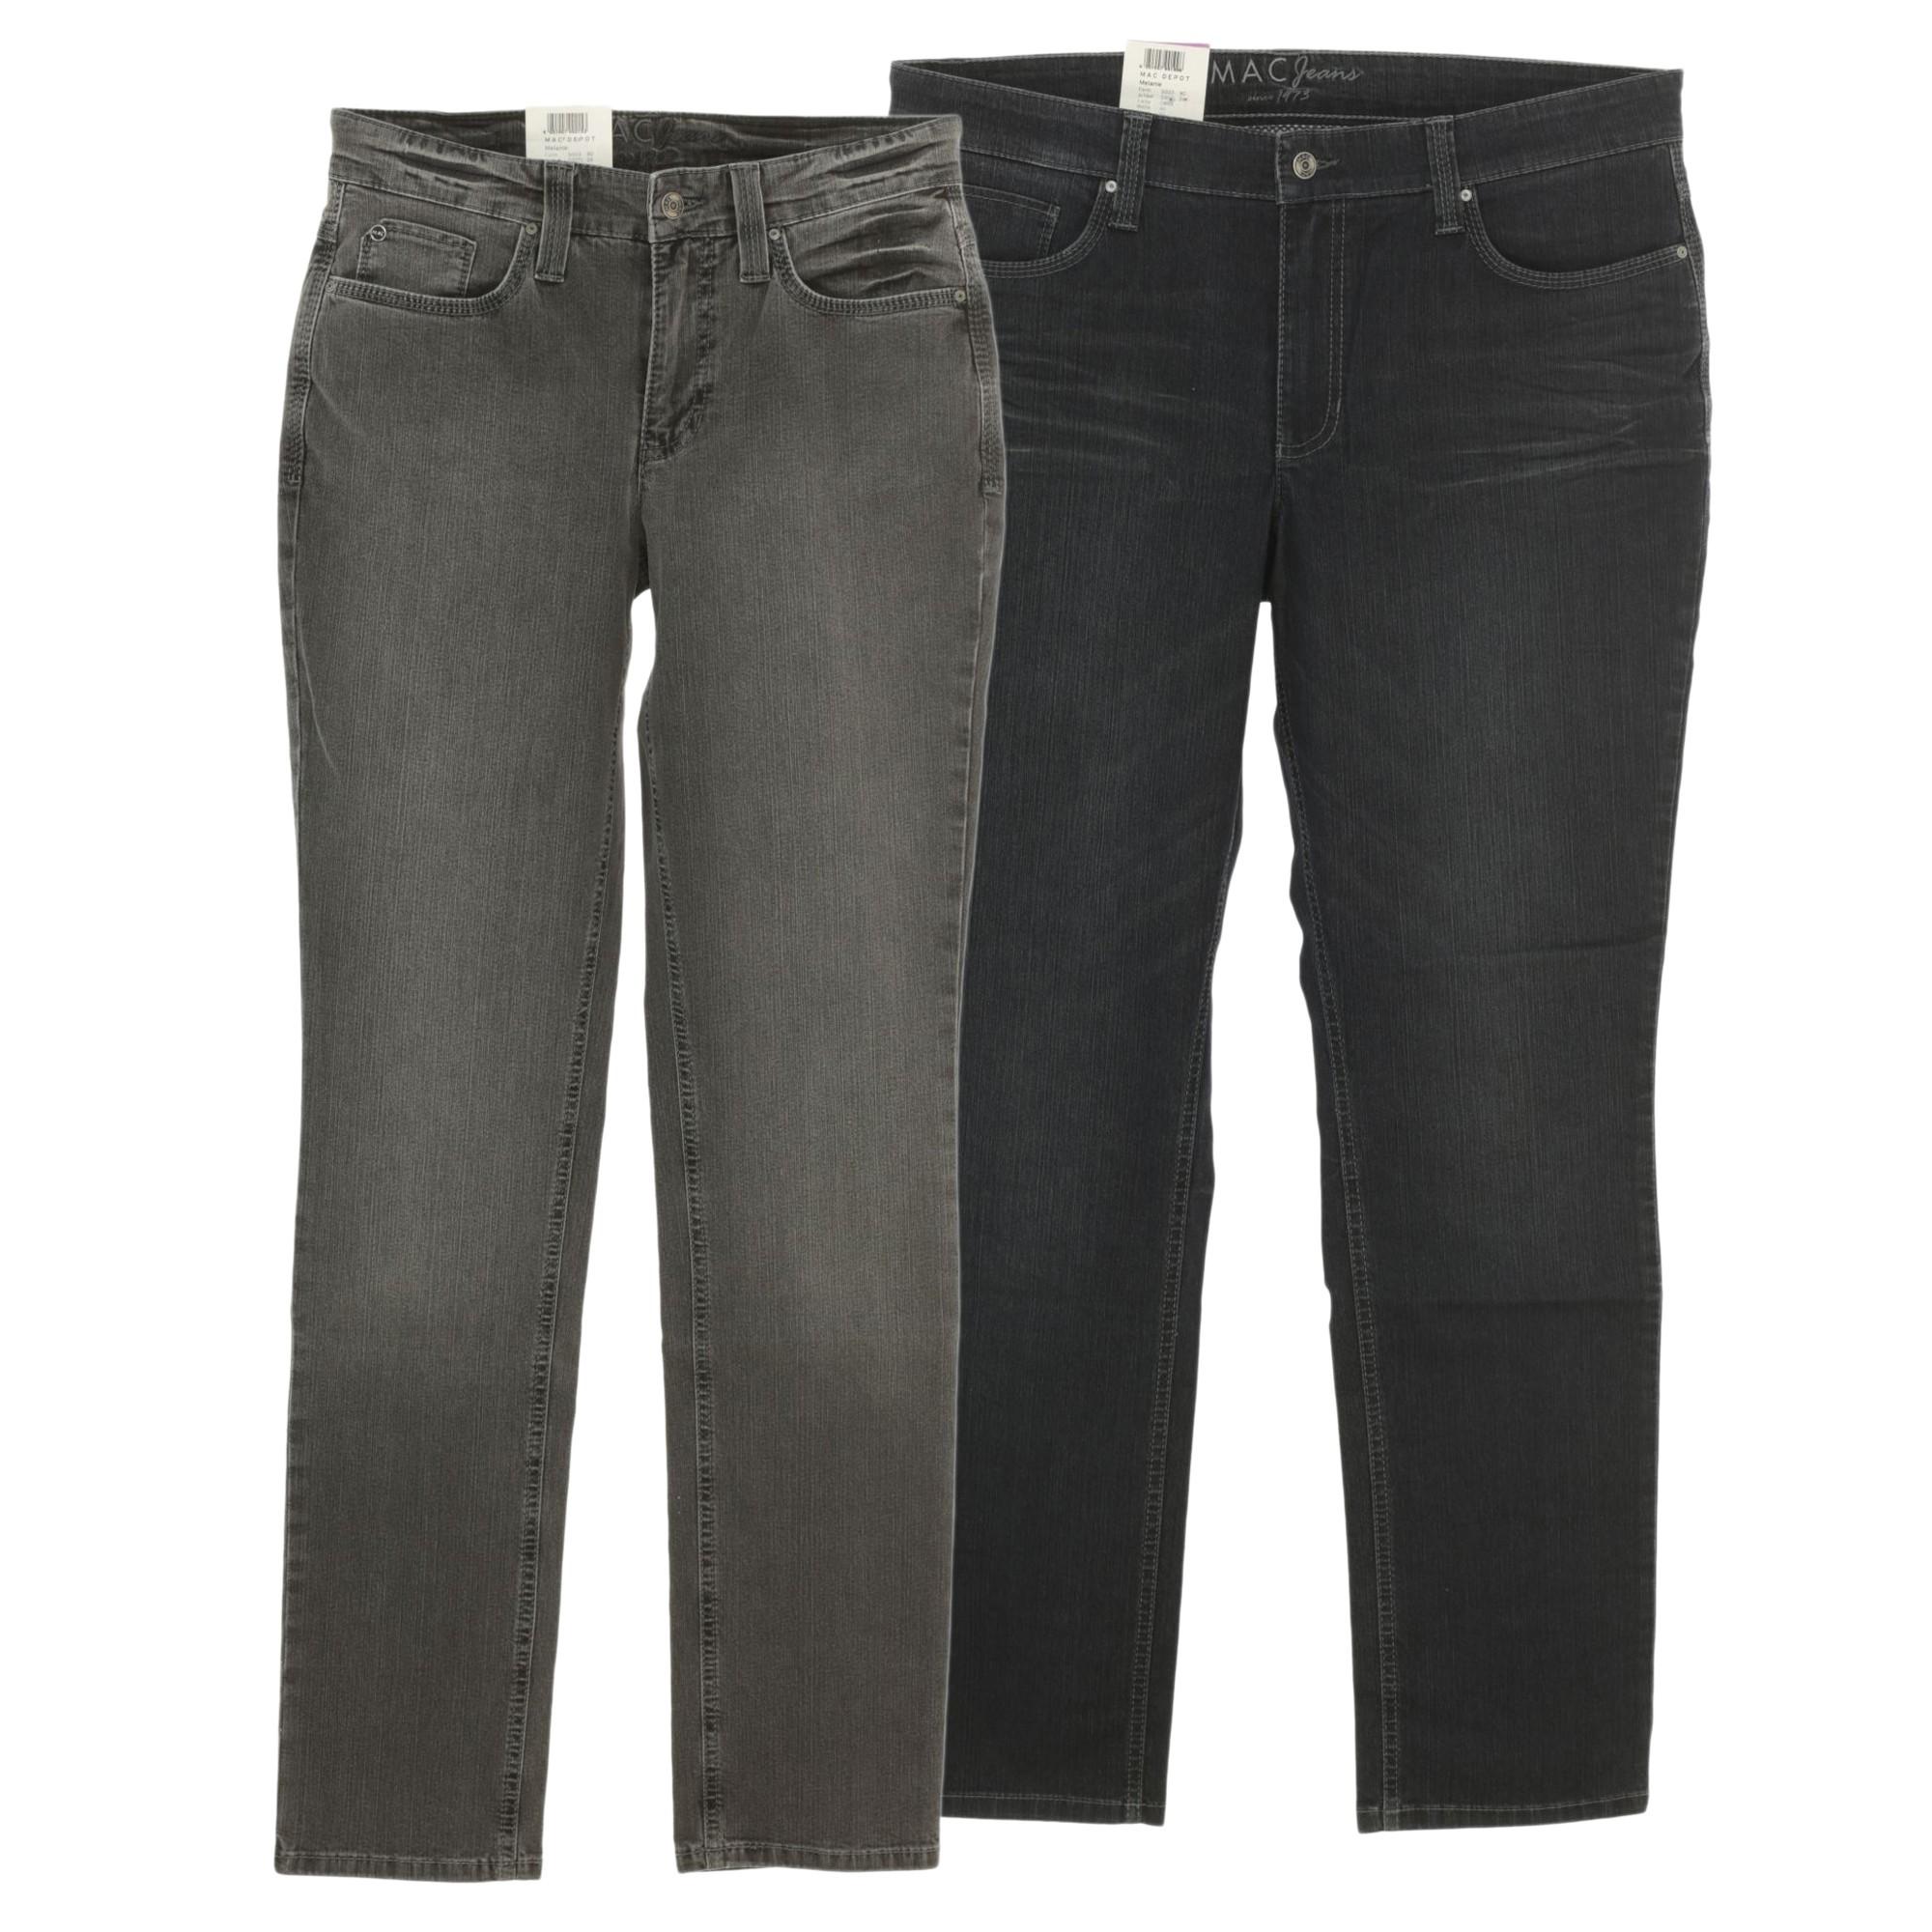 mac jeans melanie damen stretch feminine fit. Black Bedroom Furniture Sets. Home Design Ideas